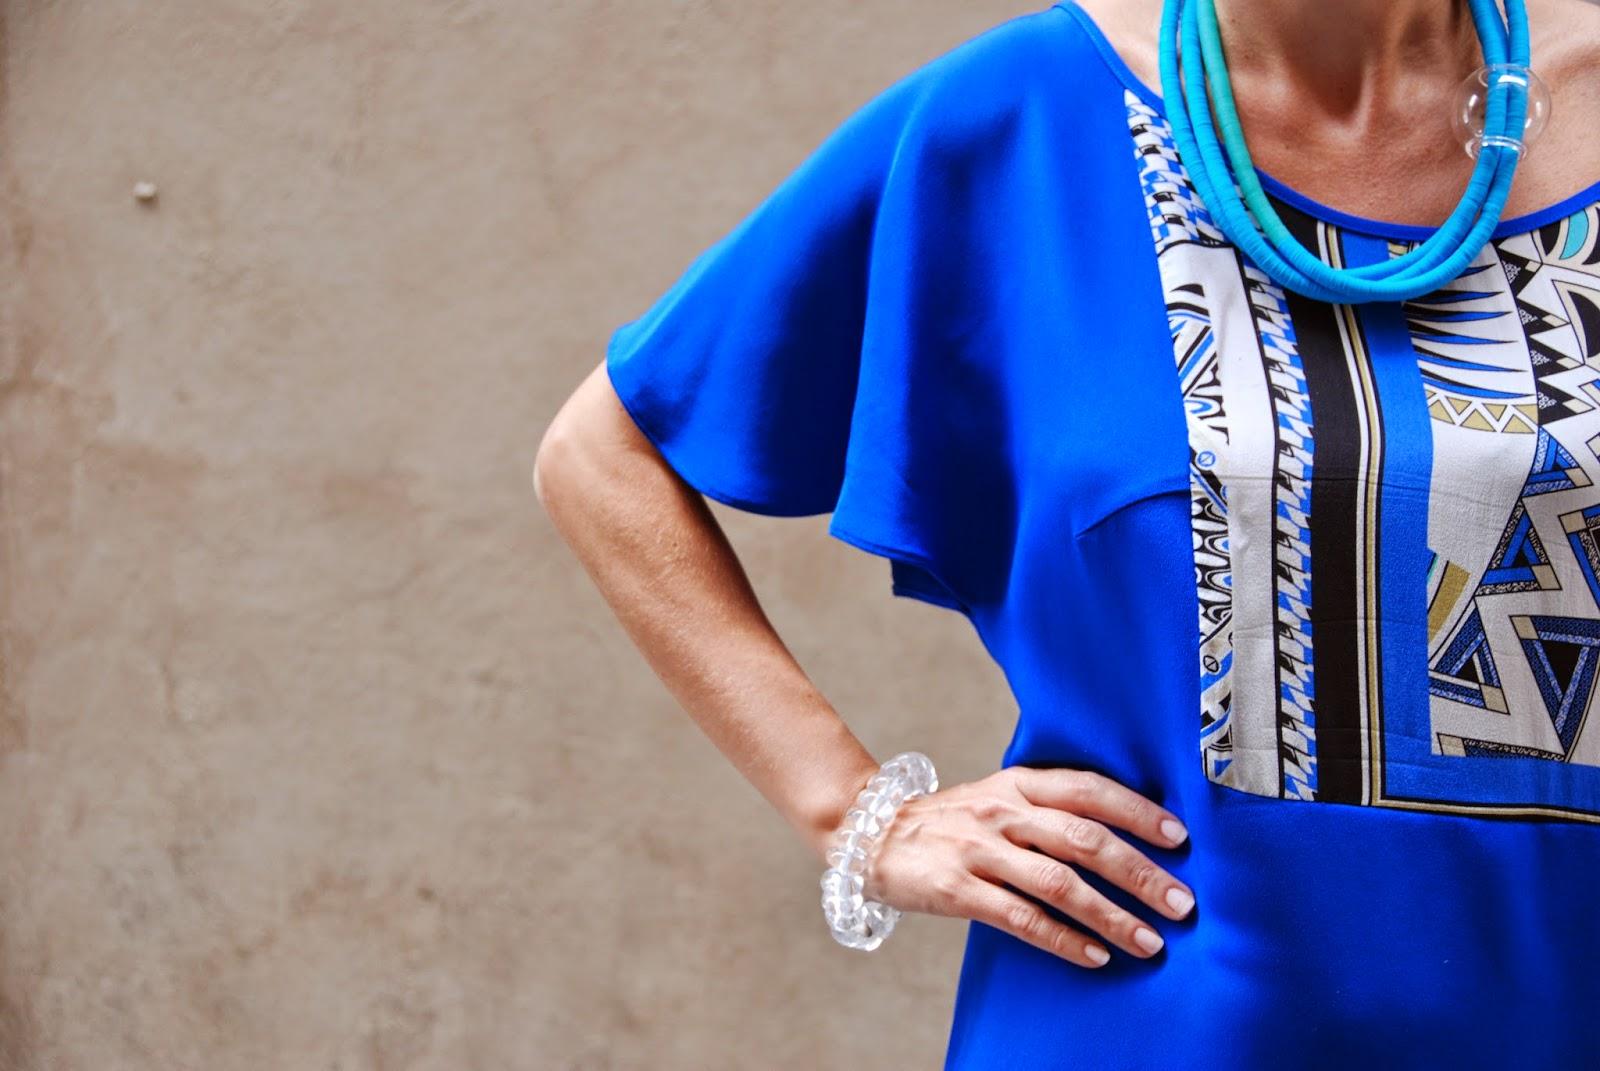 Eniwhere Fashion - Volver - Marina e Susanna Sent